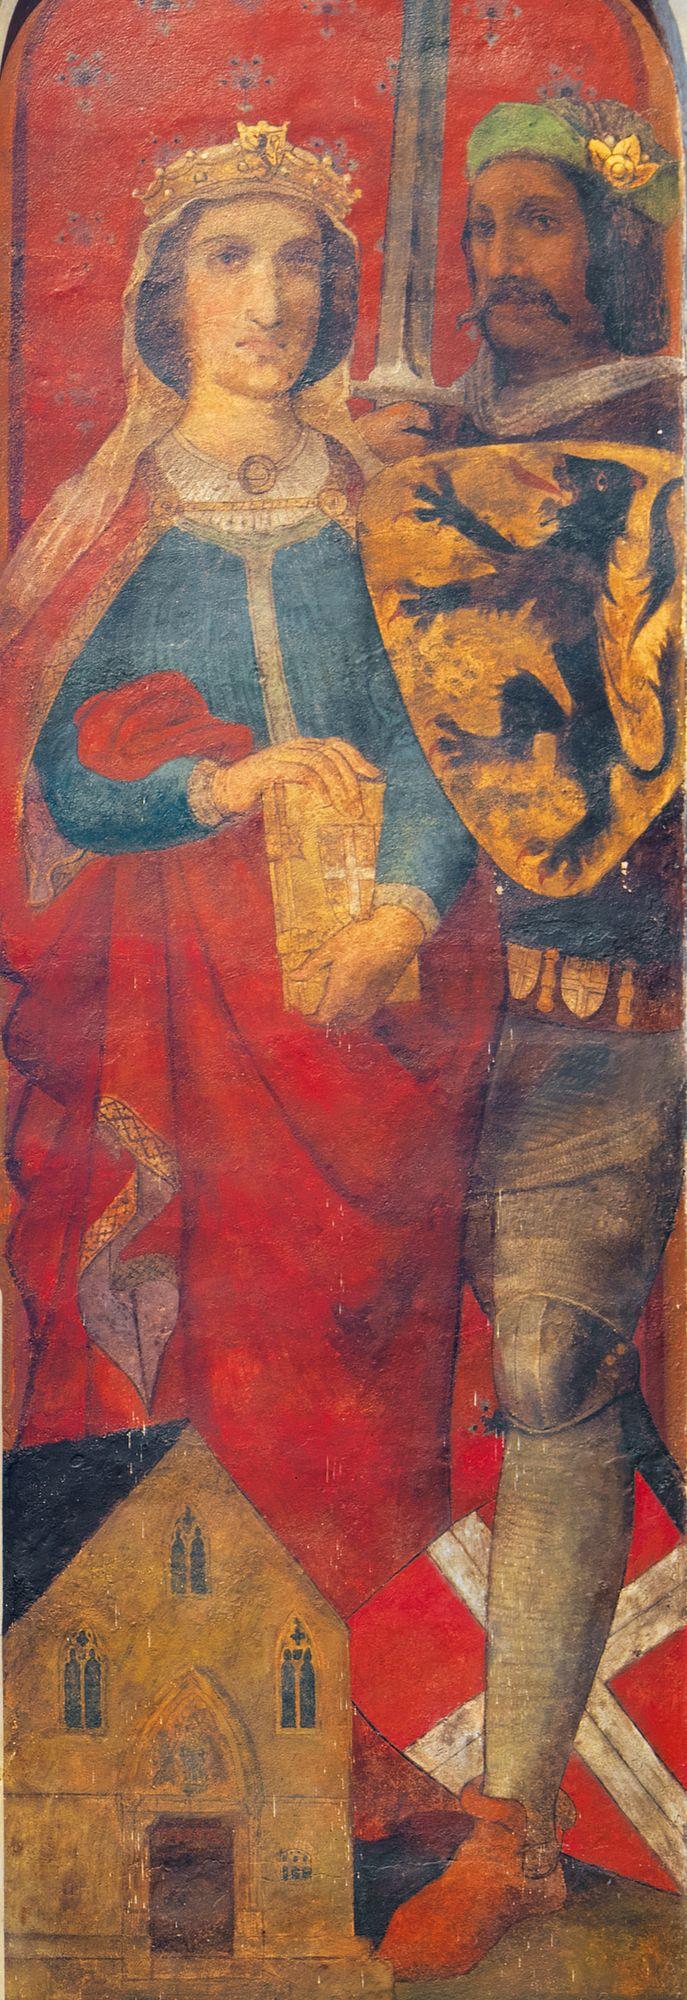 1237 - 1244 Johanna Van Constantinopel en Thomas van Savoye